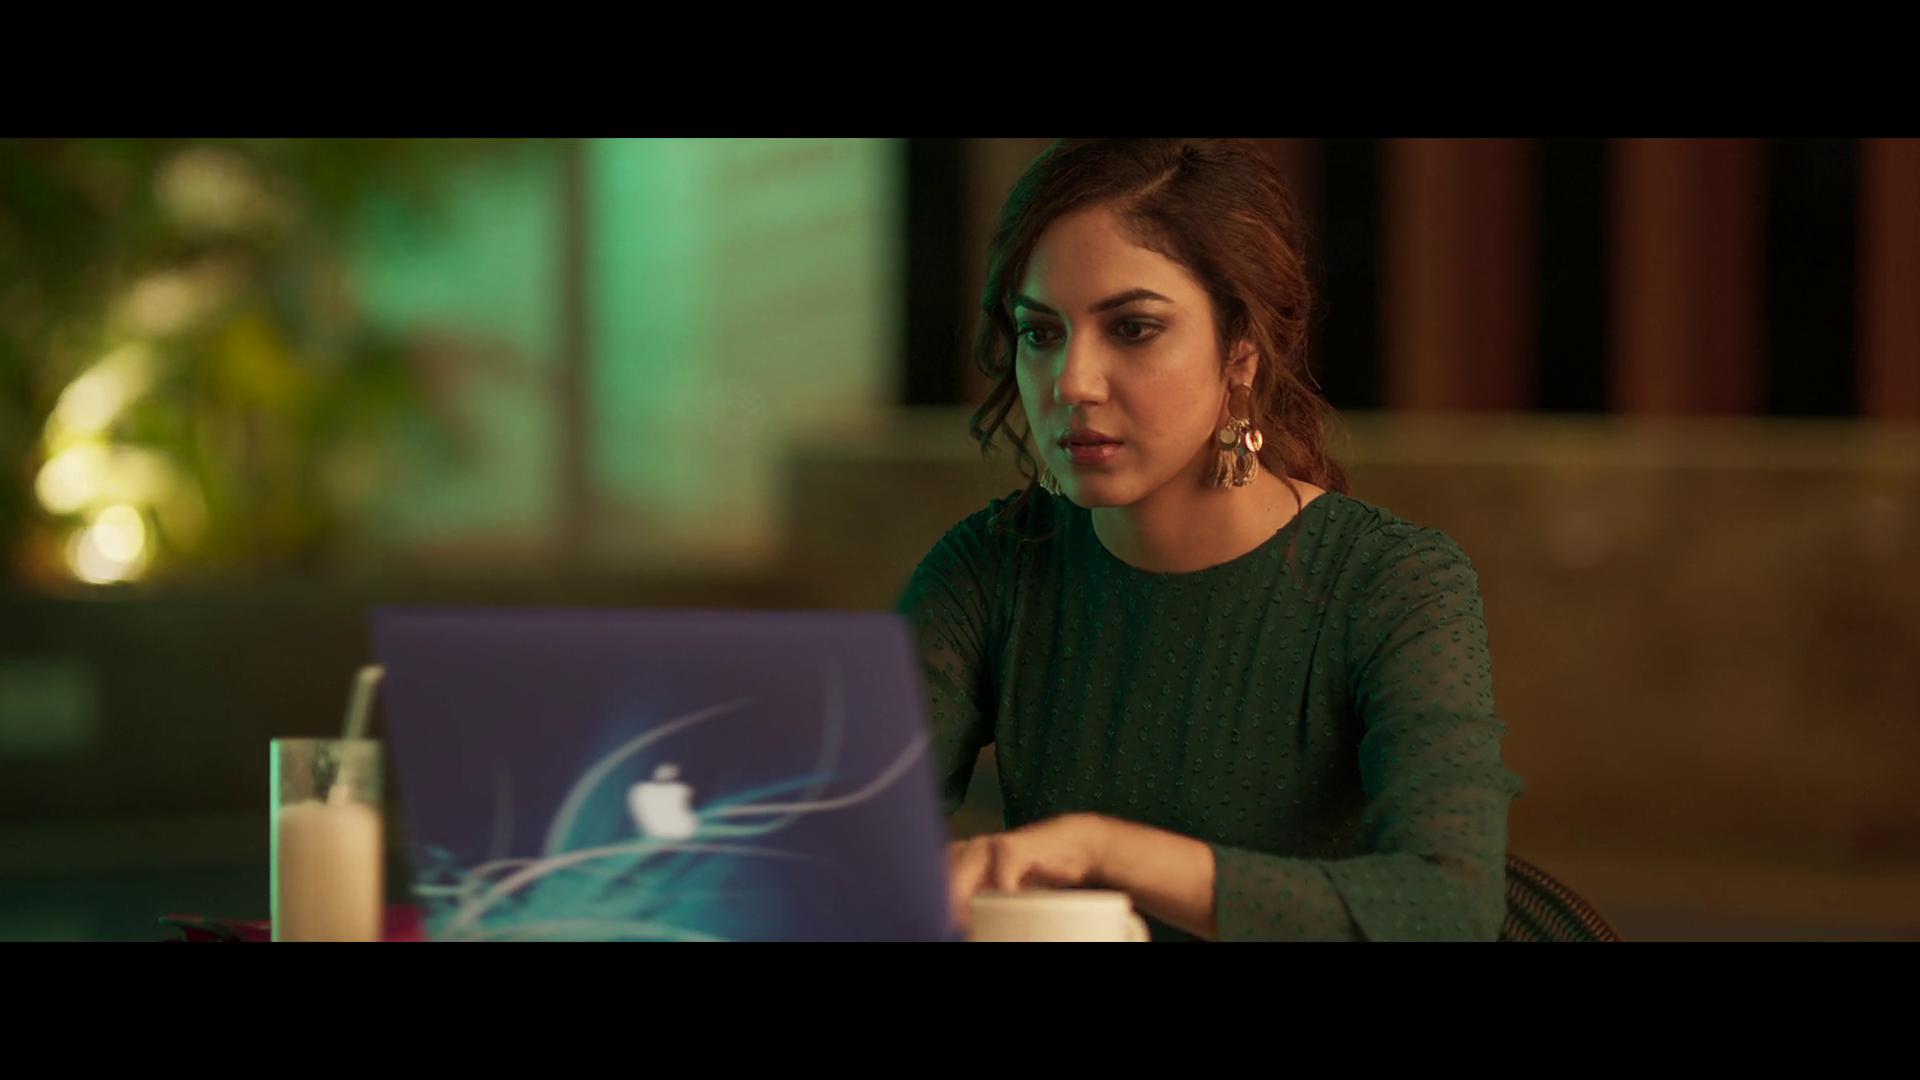 Kannum Kannum Kollaiyadithaal (2020) 1080p WEB-DL H264 DD5 1 [Dual Audio][Hindi+Tamil